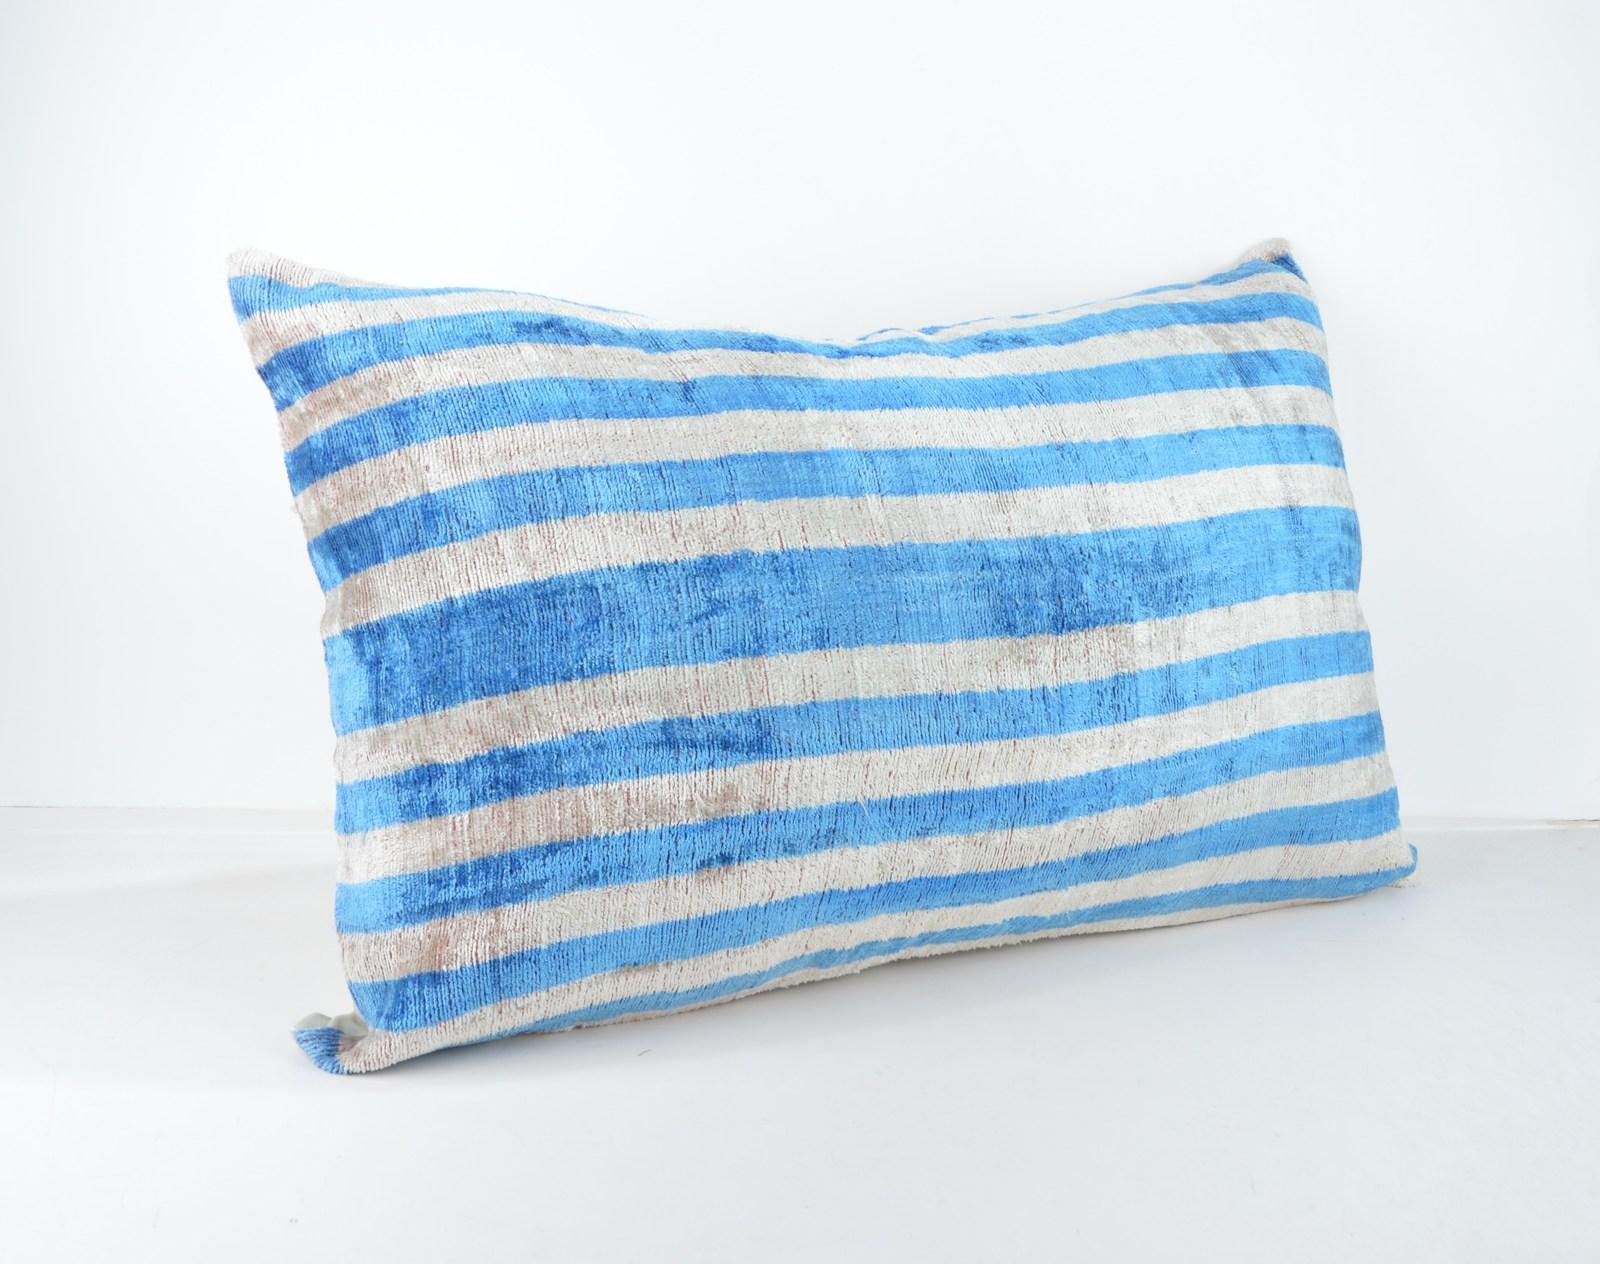 ethnic cushion 16x24 lumbar Silk Velvet Pillow,velvet lumbar pillows,ikat sham